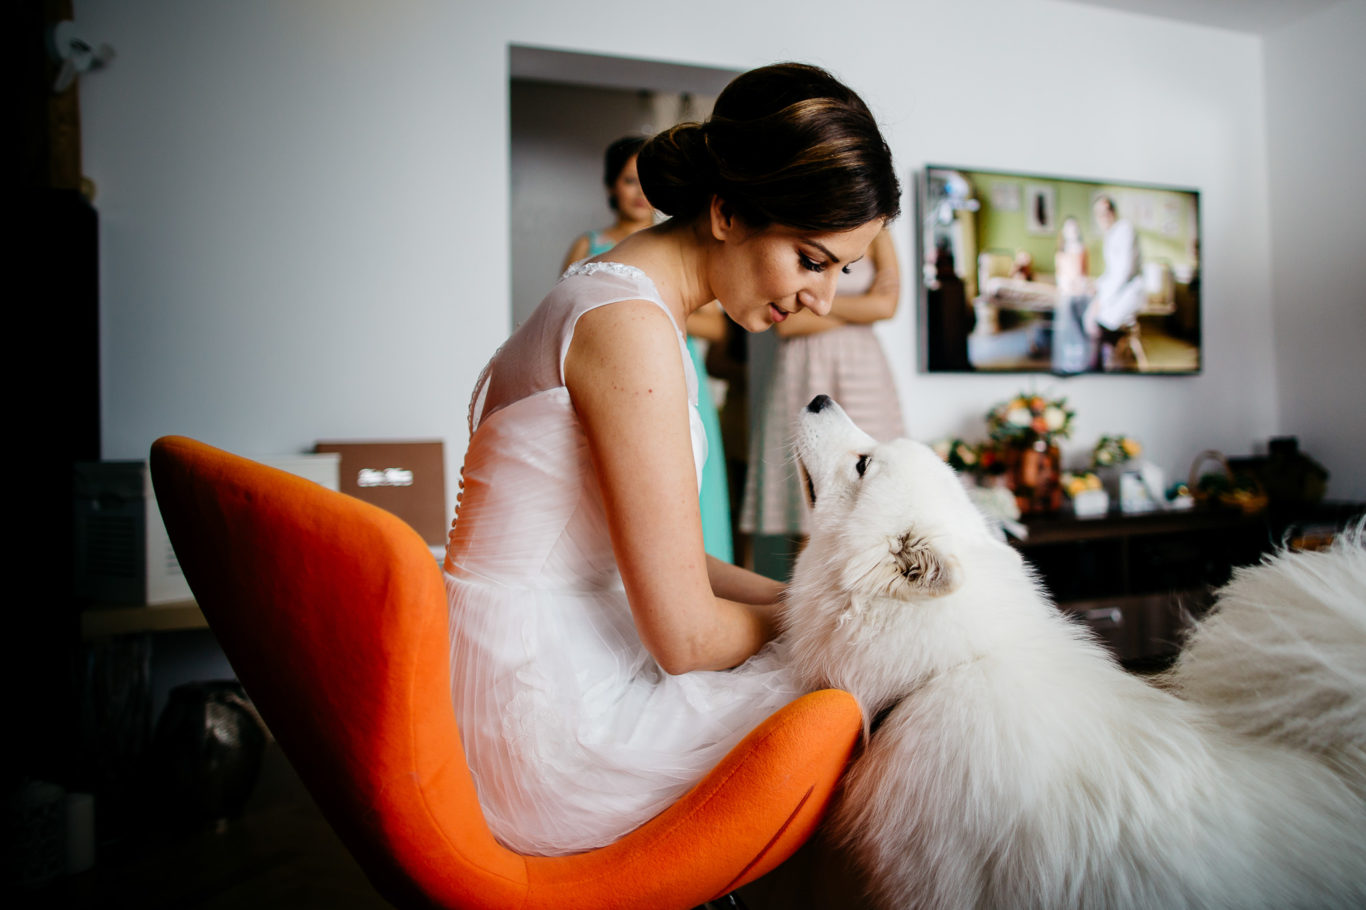 0110-Fotografie-nunta-Bucuresti-Oana-Catalin-fotograf-Ciprian-Dumitrescu-DCF_1763